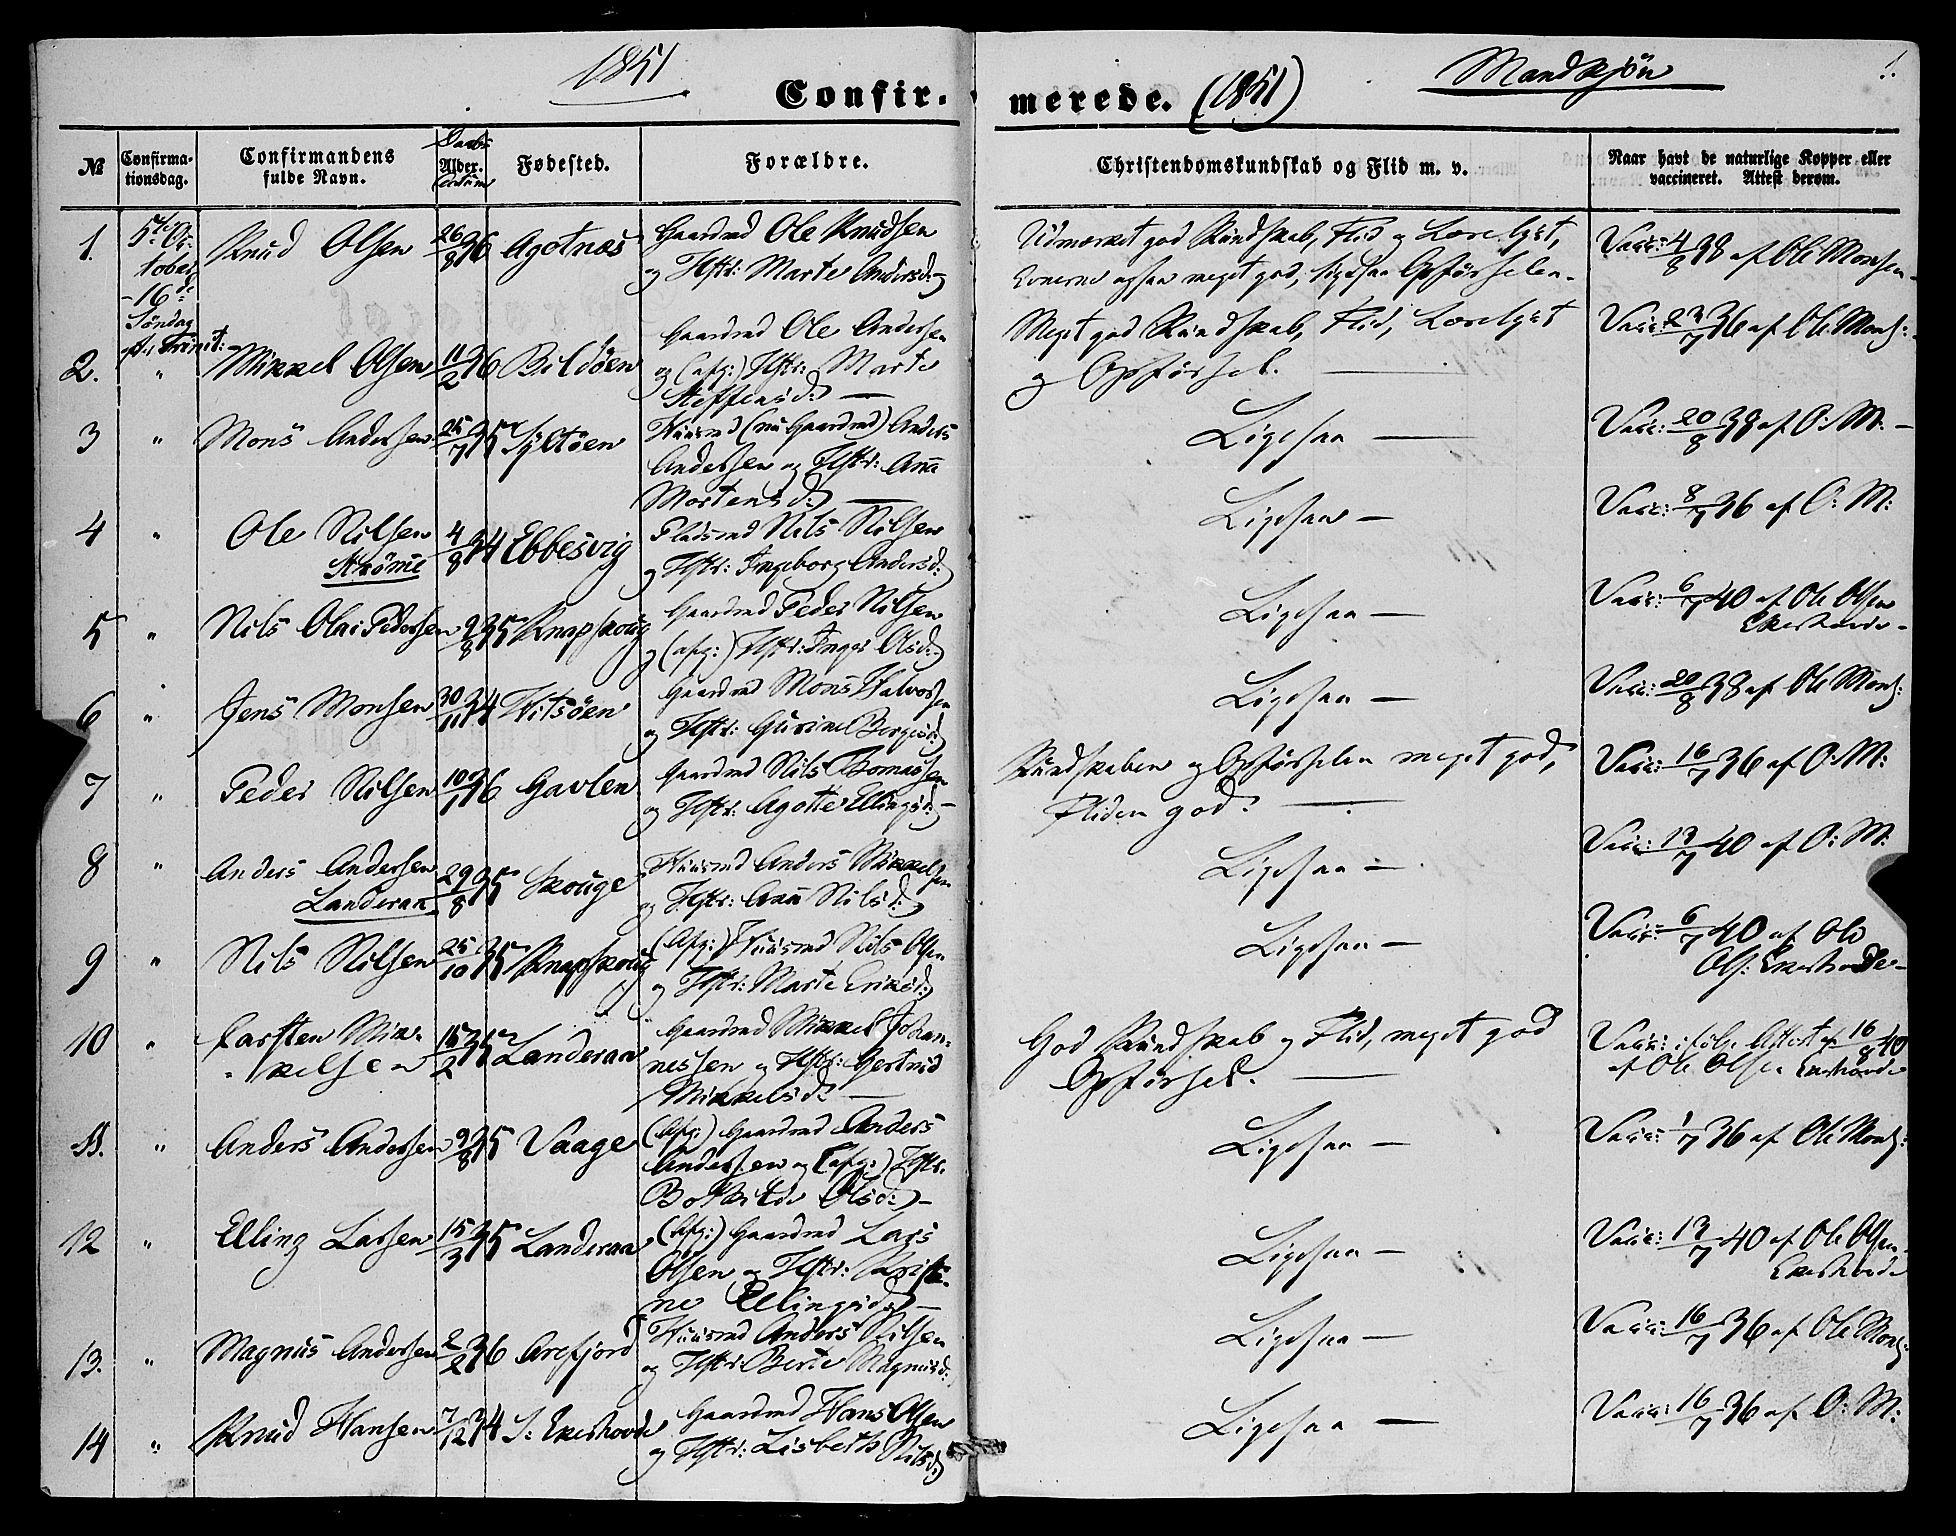 SAB, Fjell sokneprestembete, H/Haa: Parish register (official) no. A 4, 1851-1870, p. 1